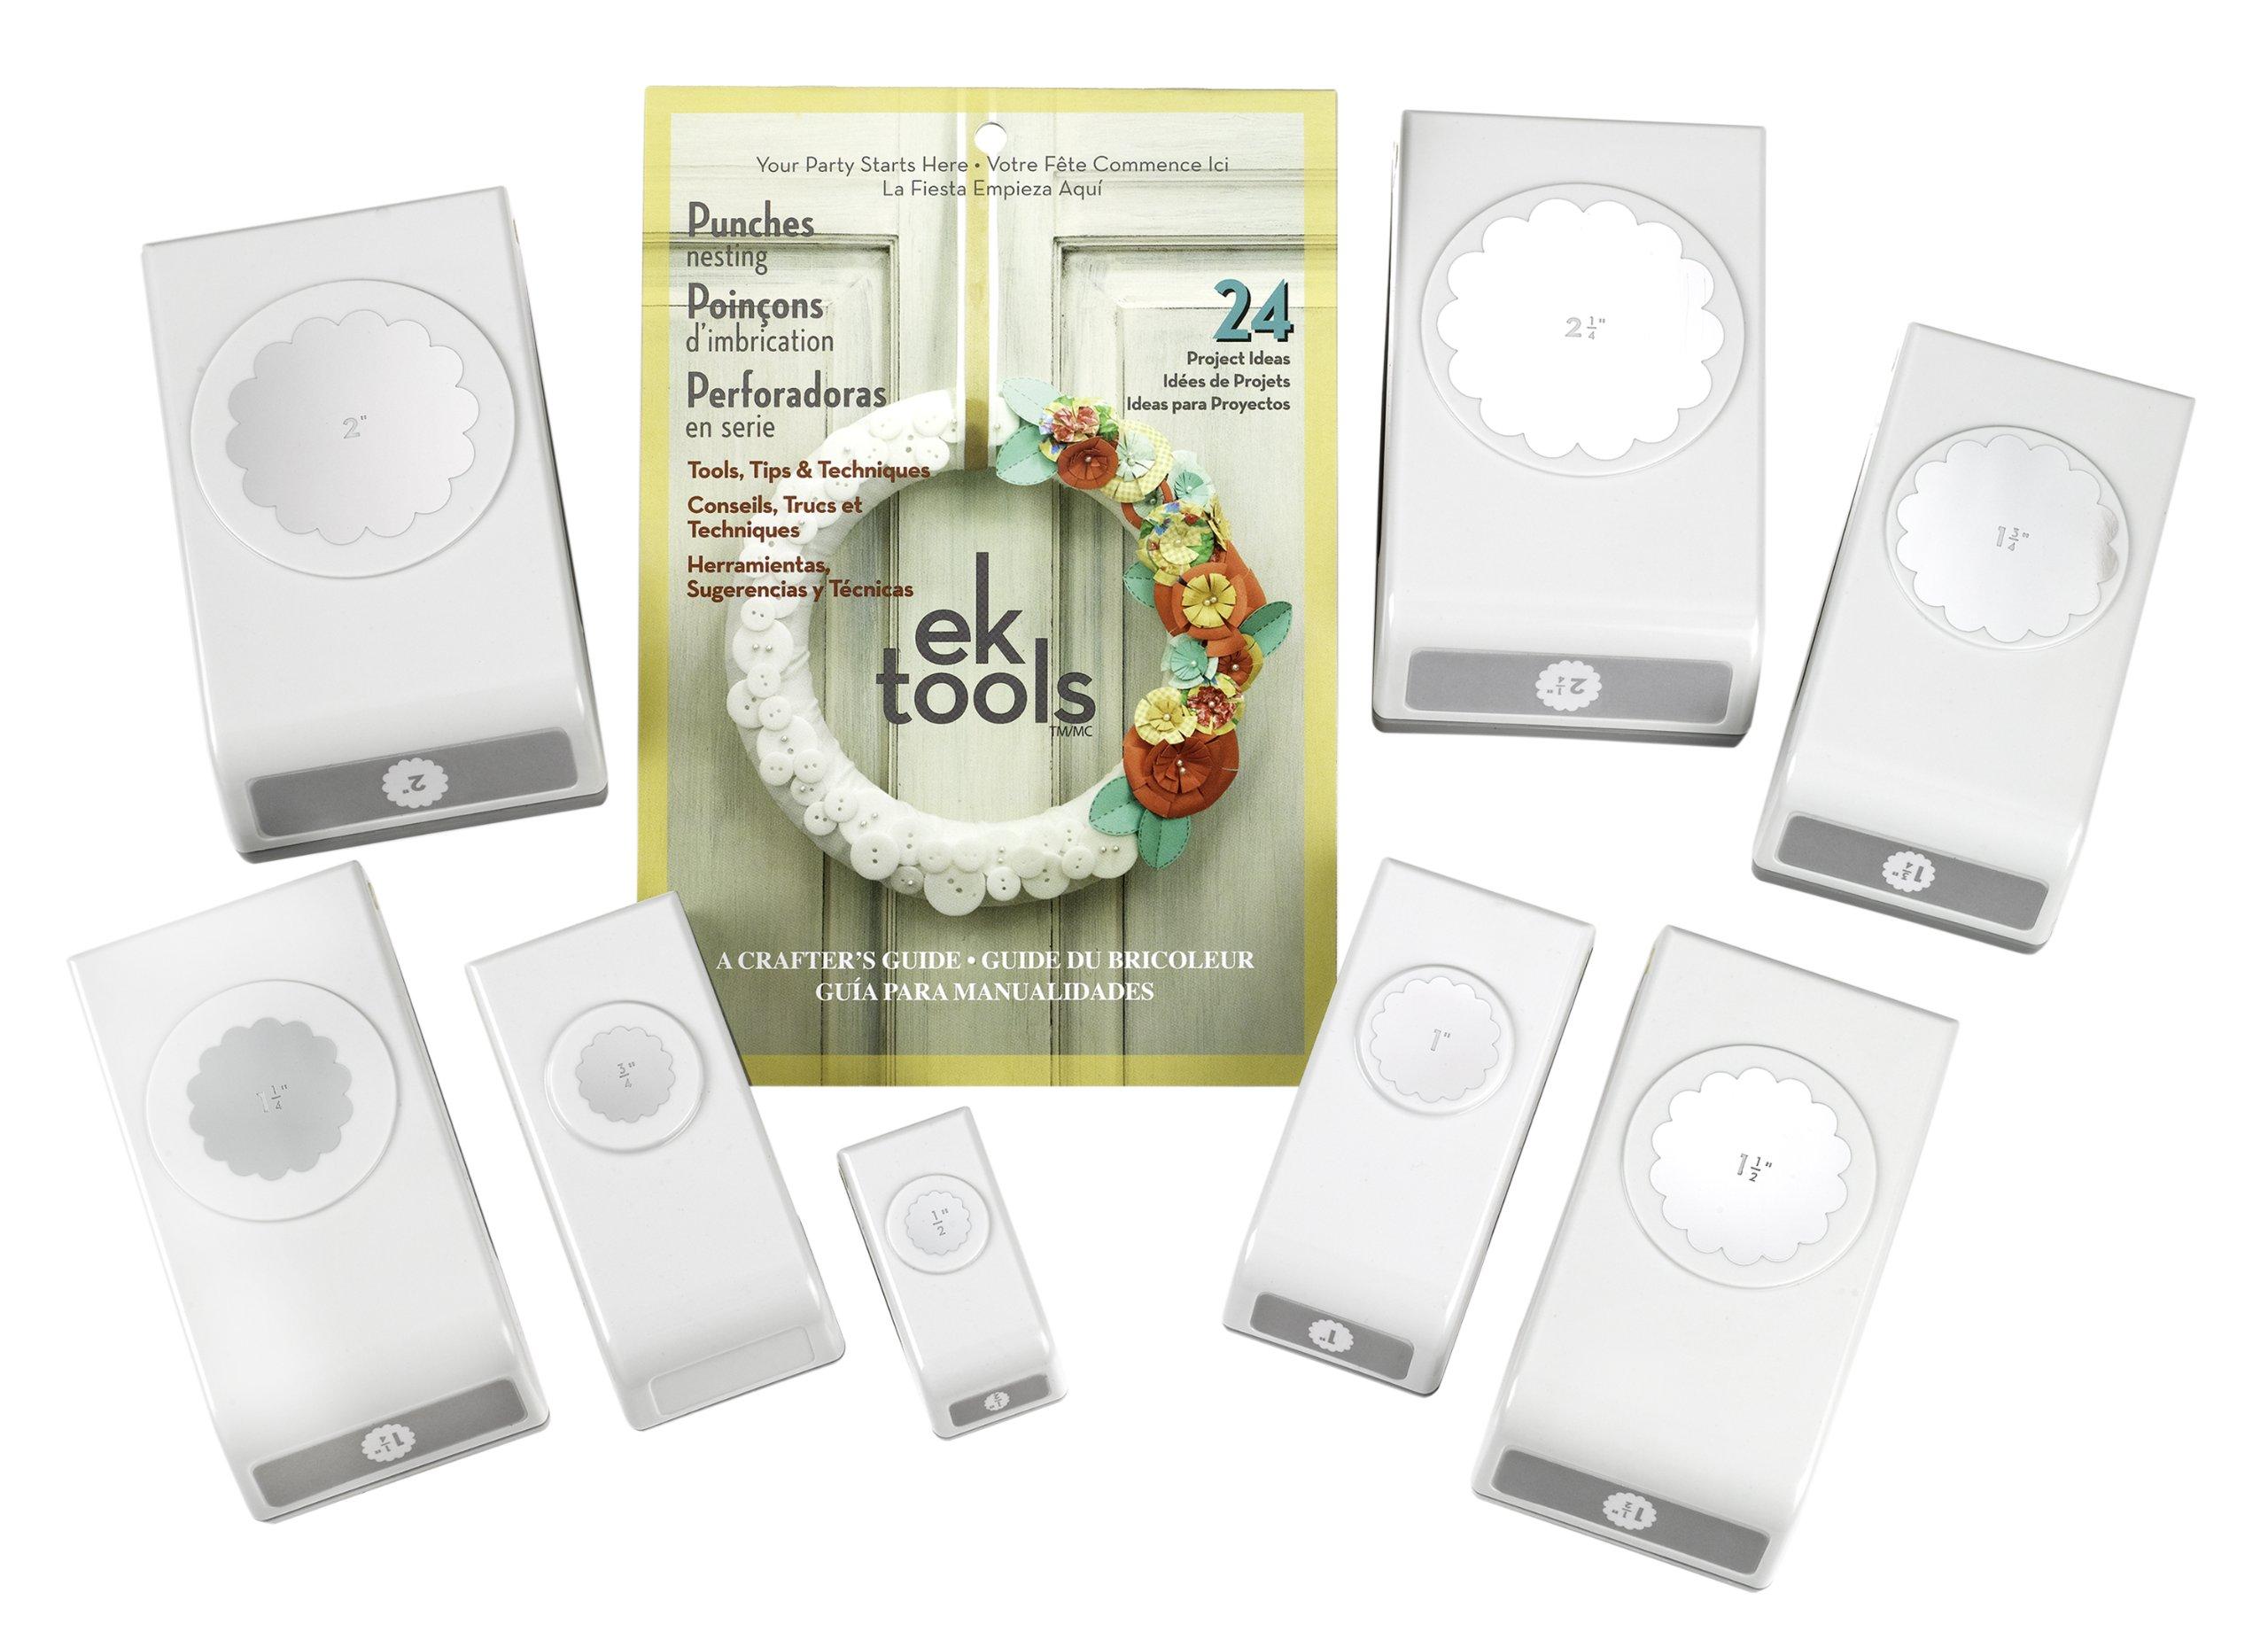 ek tools Circles and Scallop Nesting Punch Kit